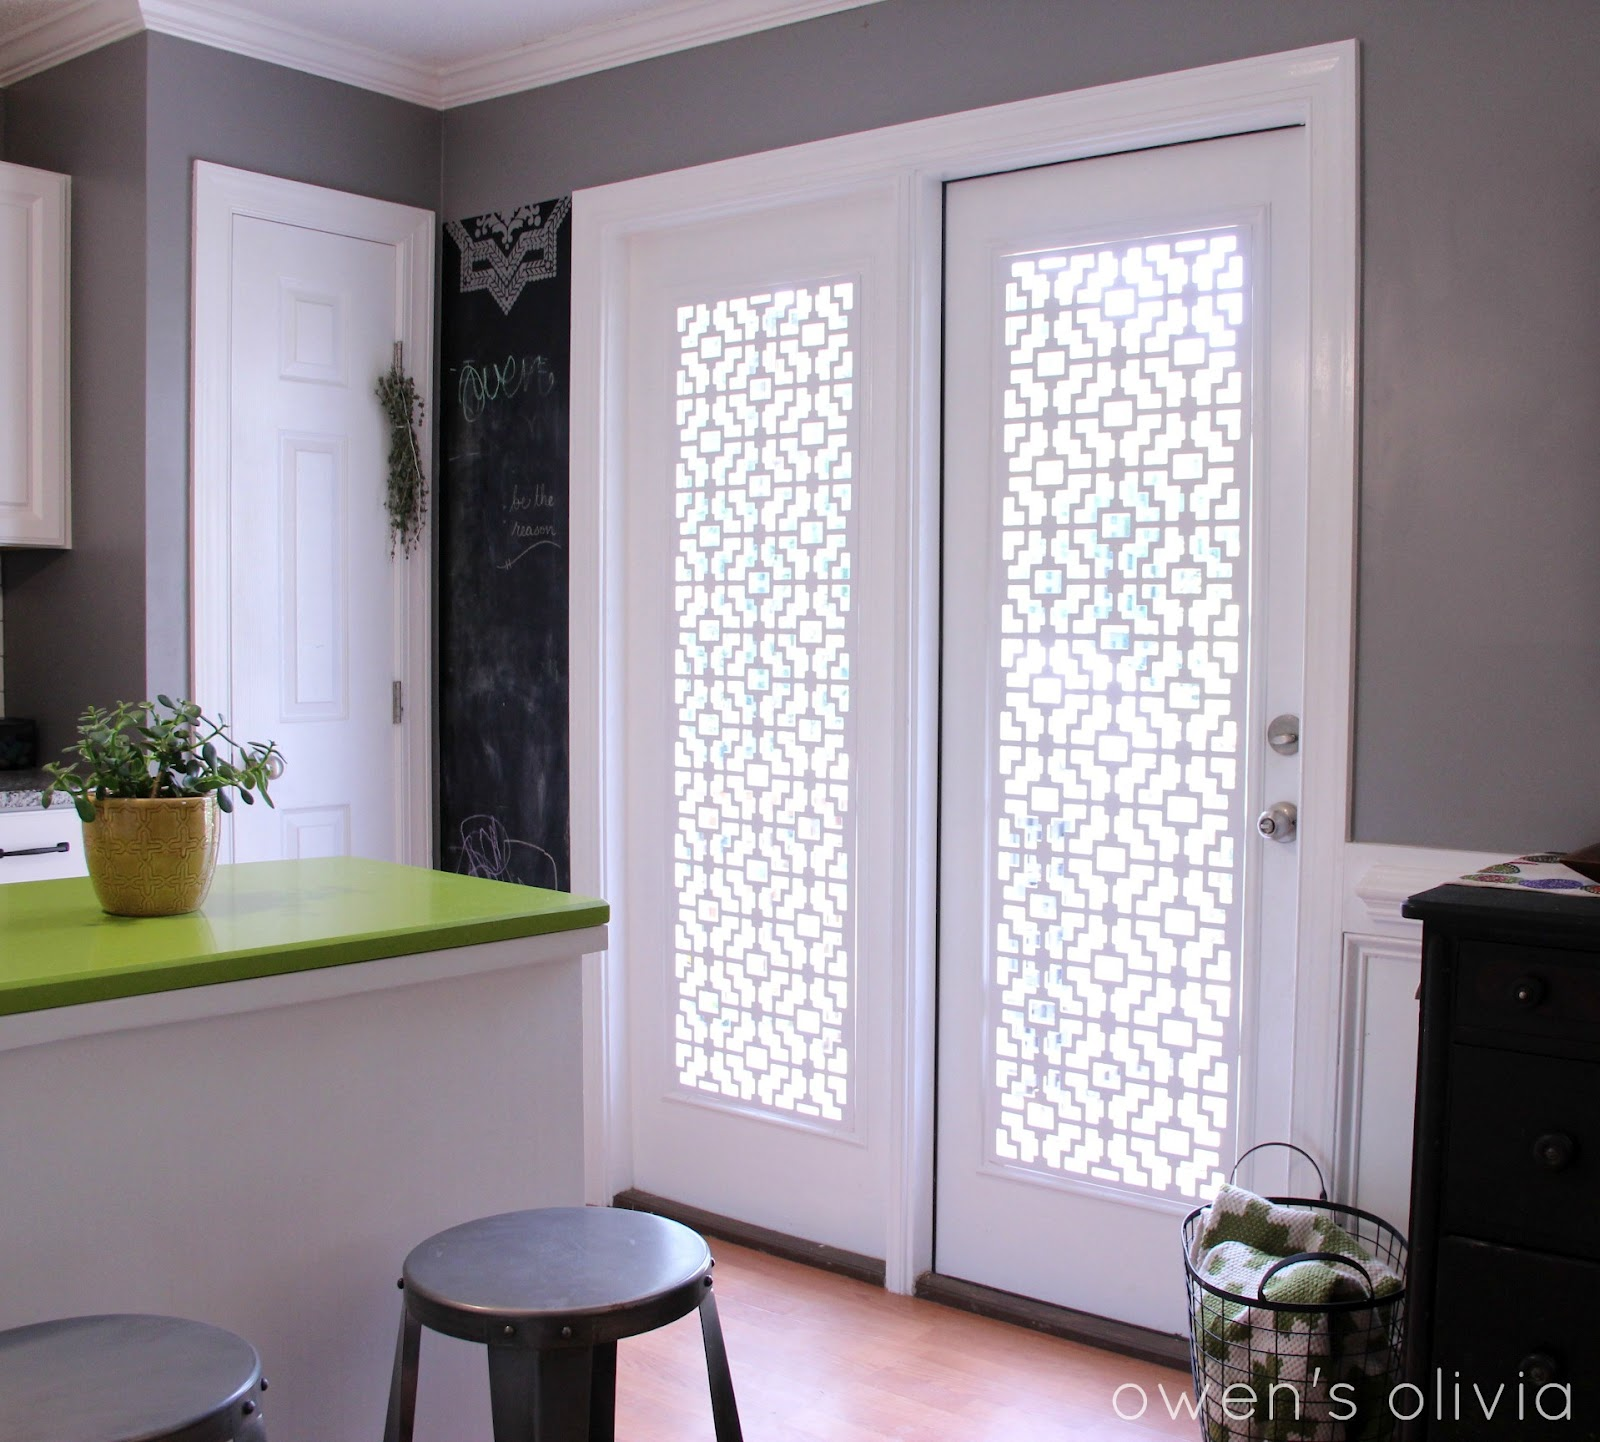 Amazing Owenu0027s Olivia: Custom Window Treatments Using PVC. I u003c3 this for my kitchen. window treatments for french doors in kitchen